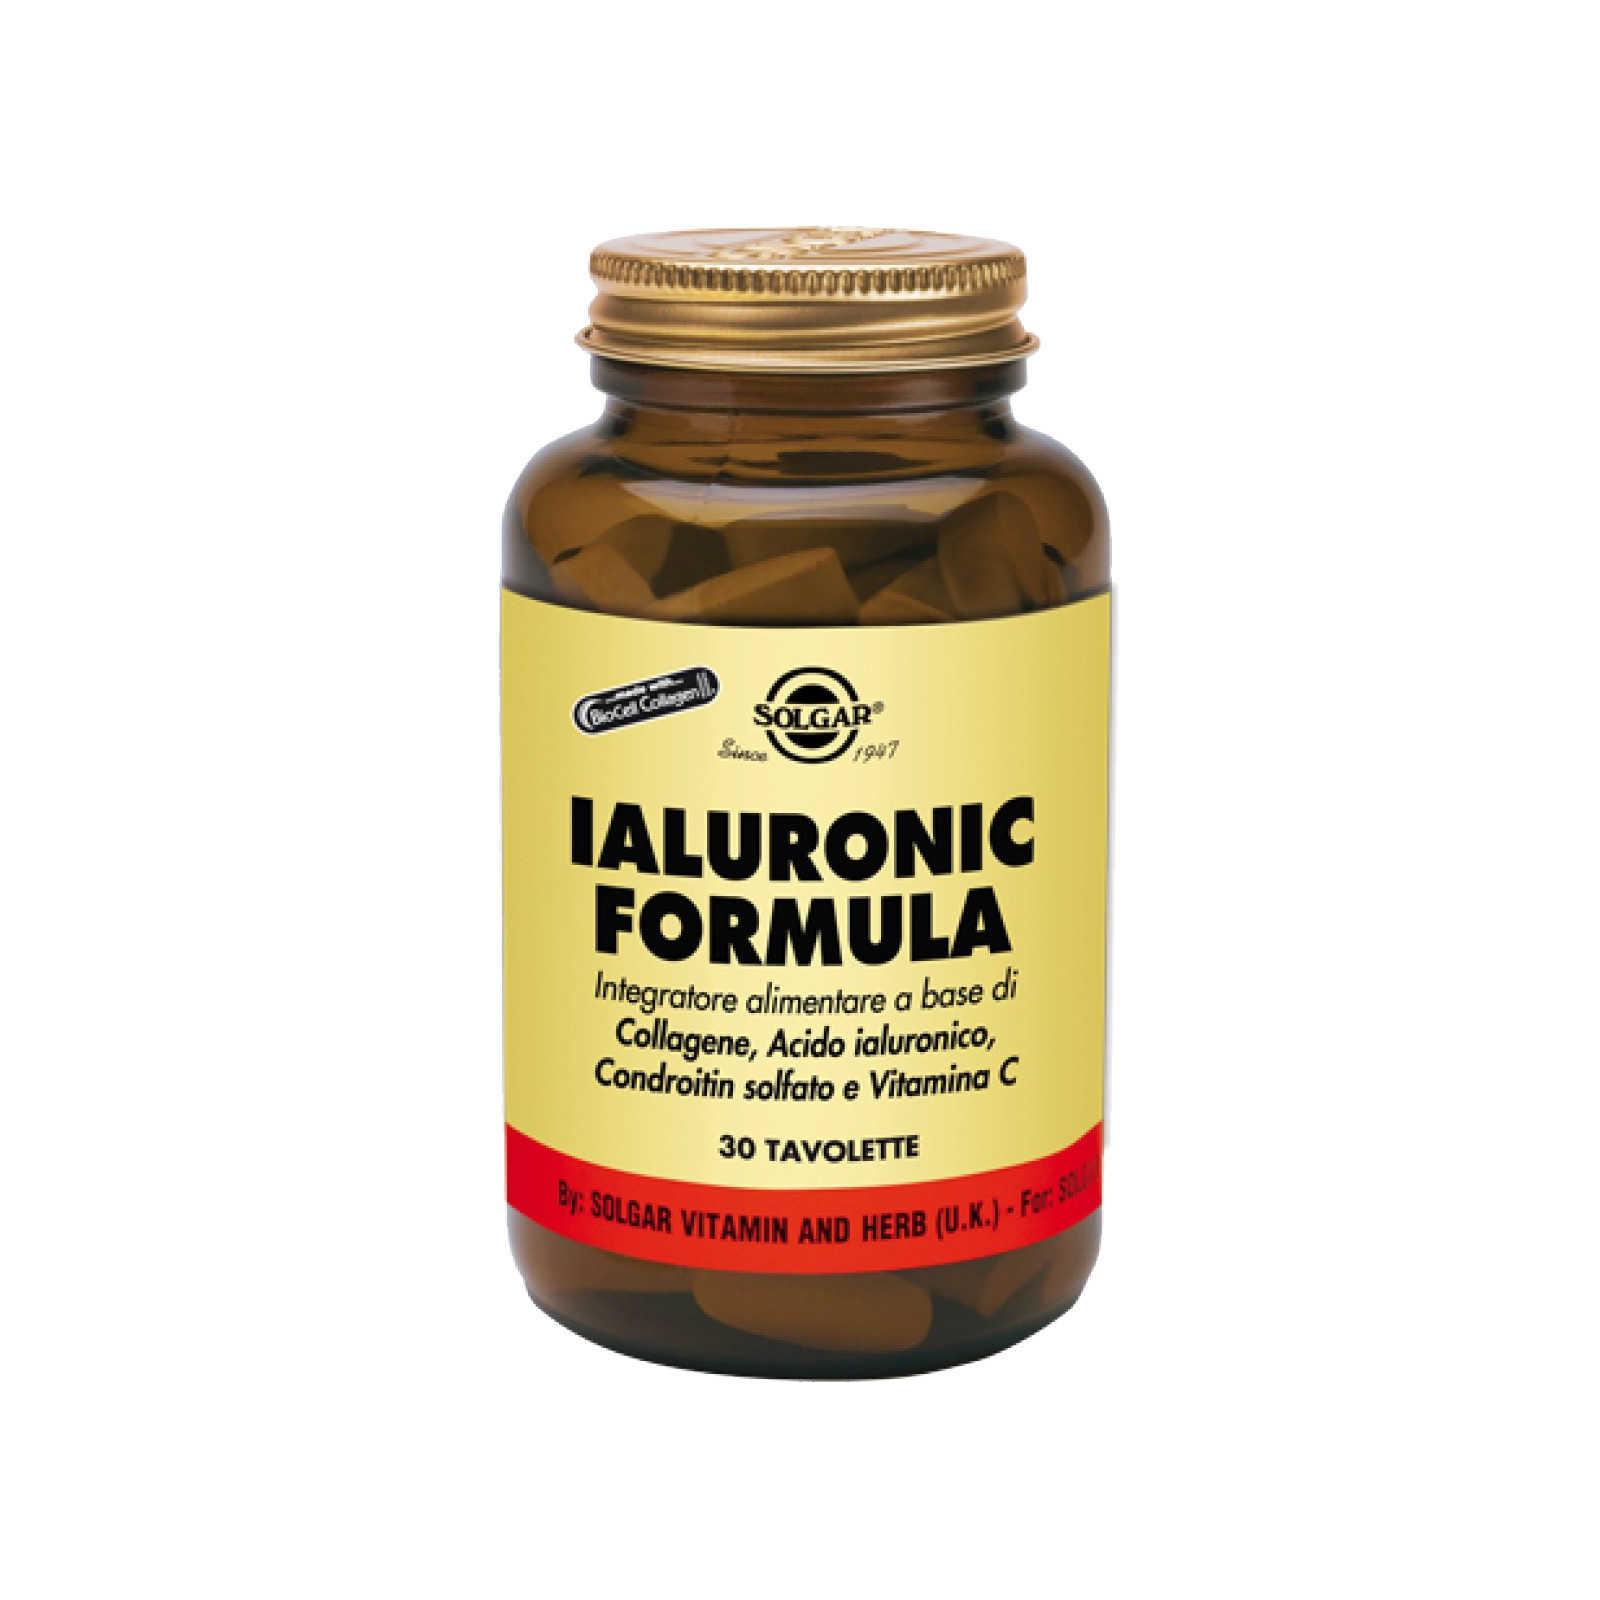 Solgar - Ialuronic Formula - Integratore Aliemtare